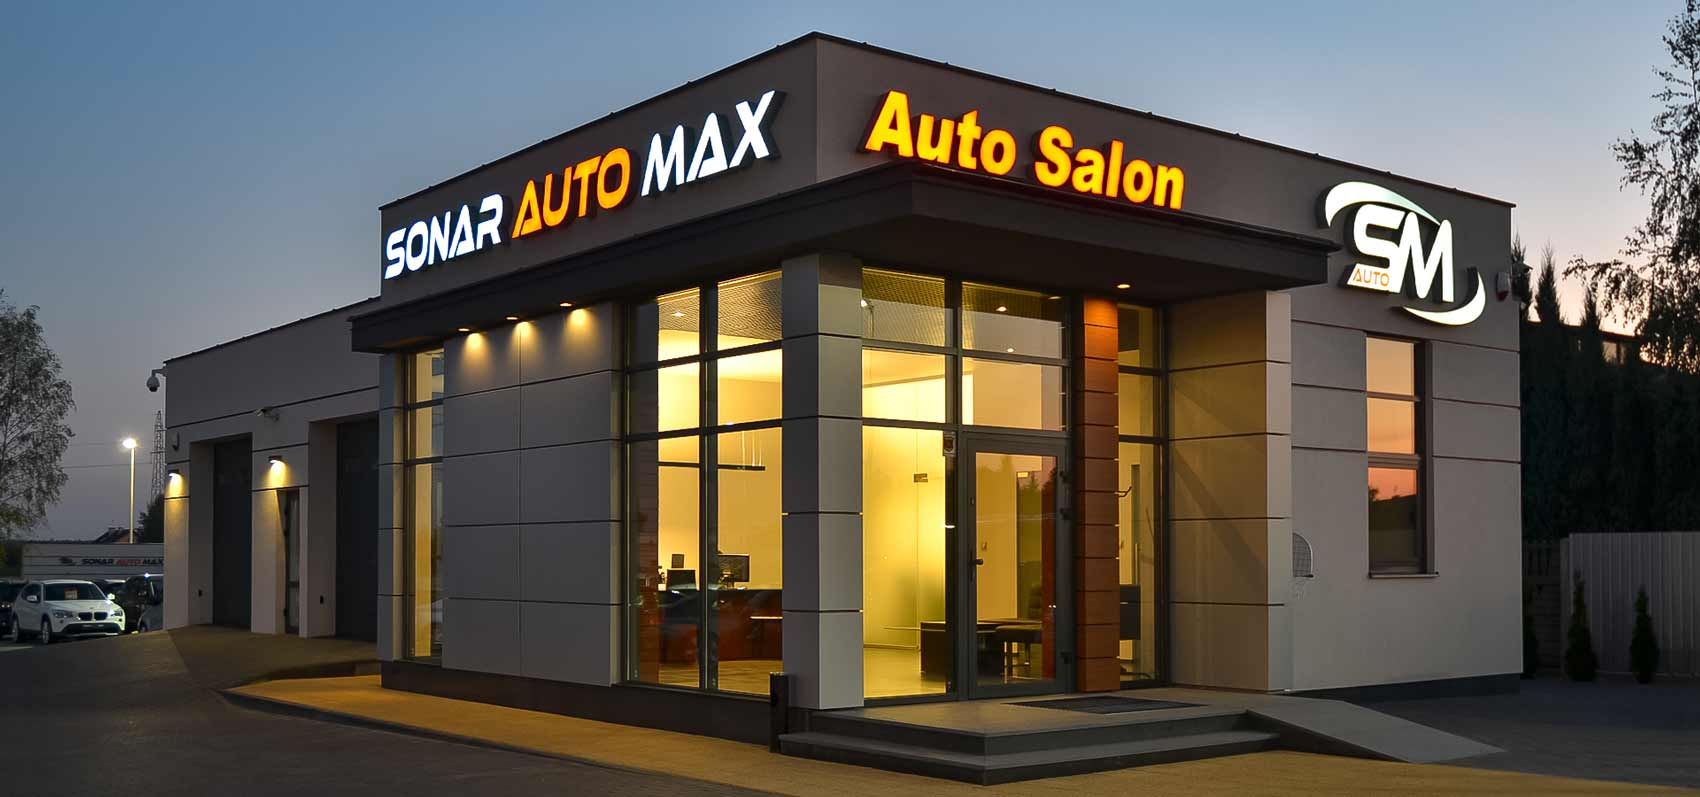 Litery blokowe Sonar Auto Max